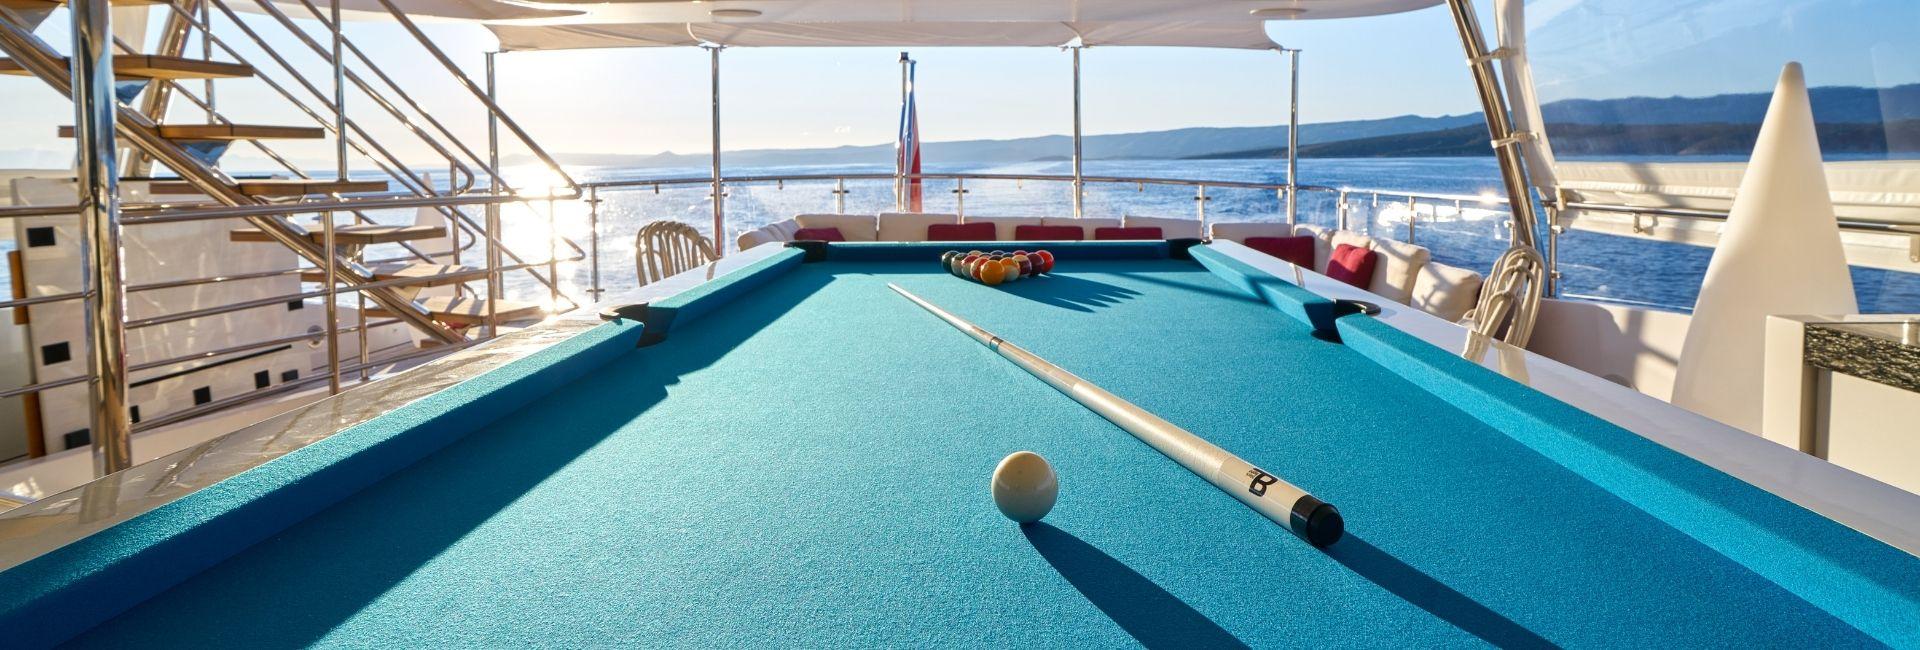 Pool table on boat luxury - Billards Toulet